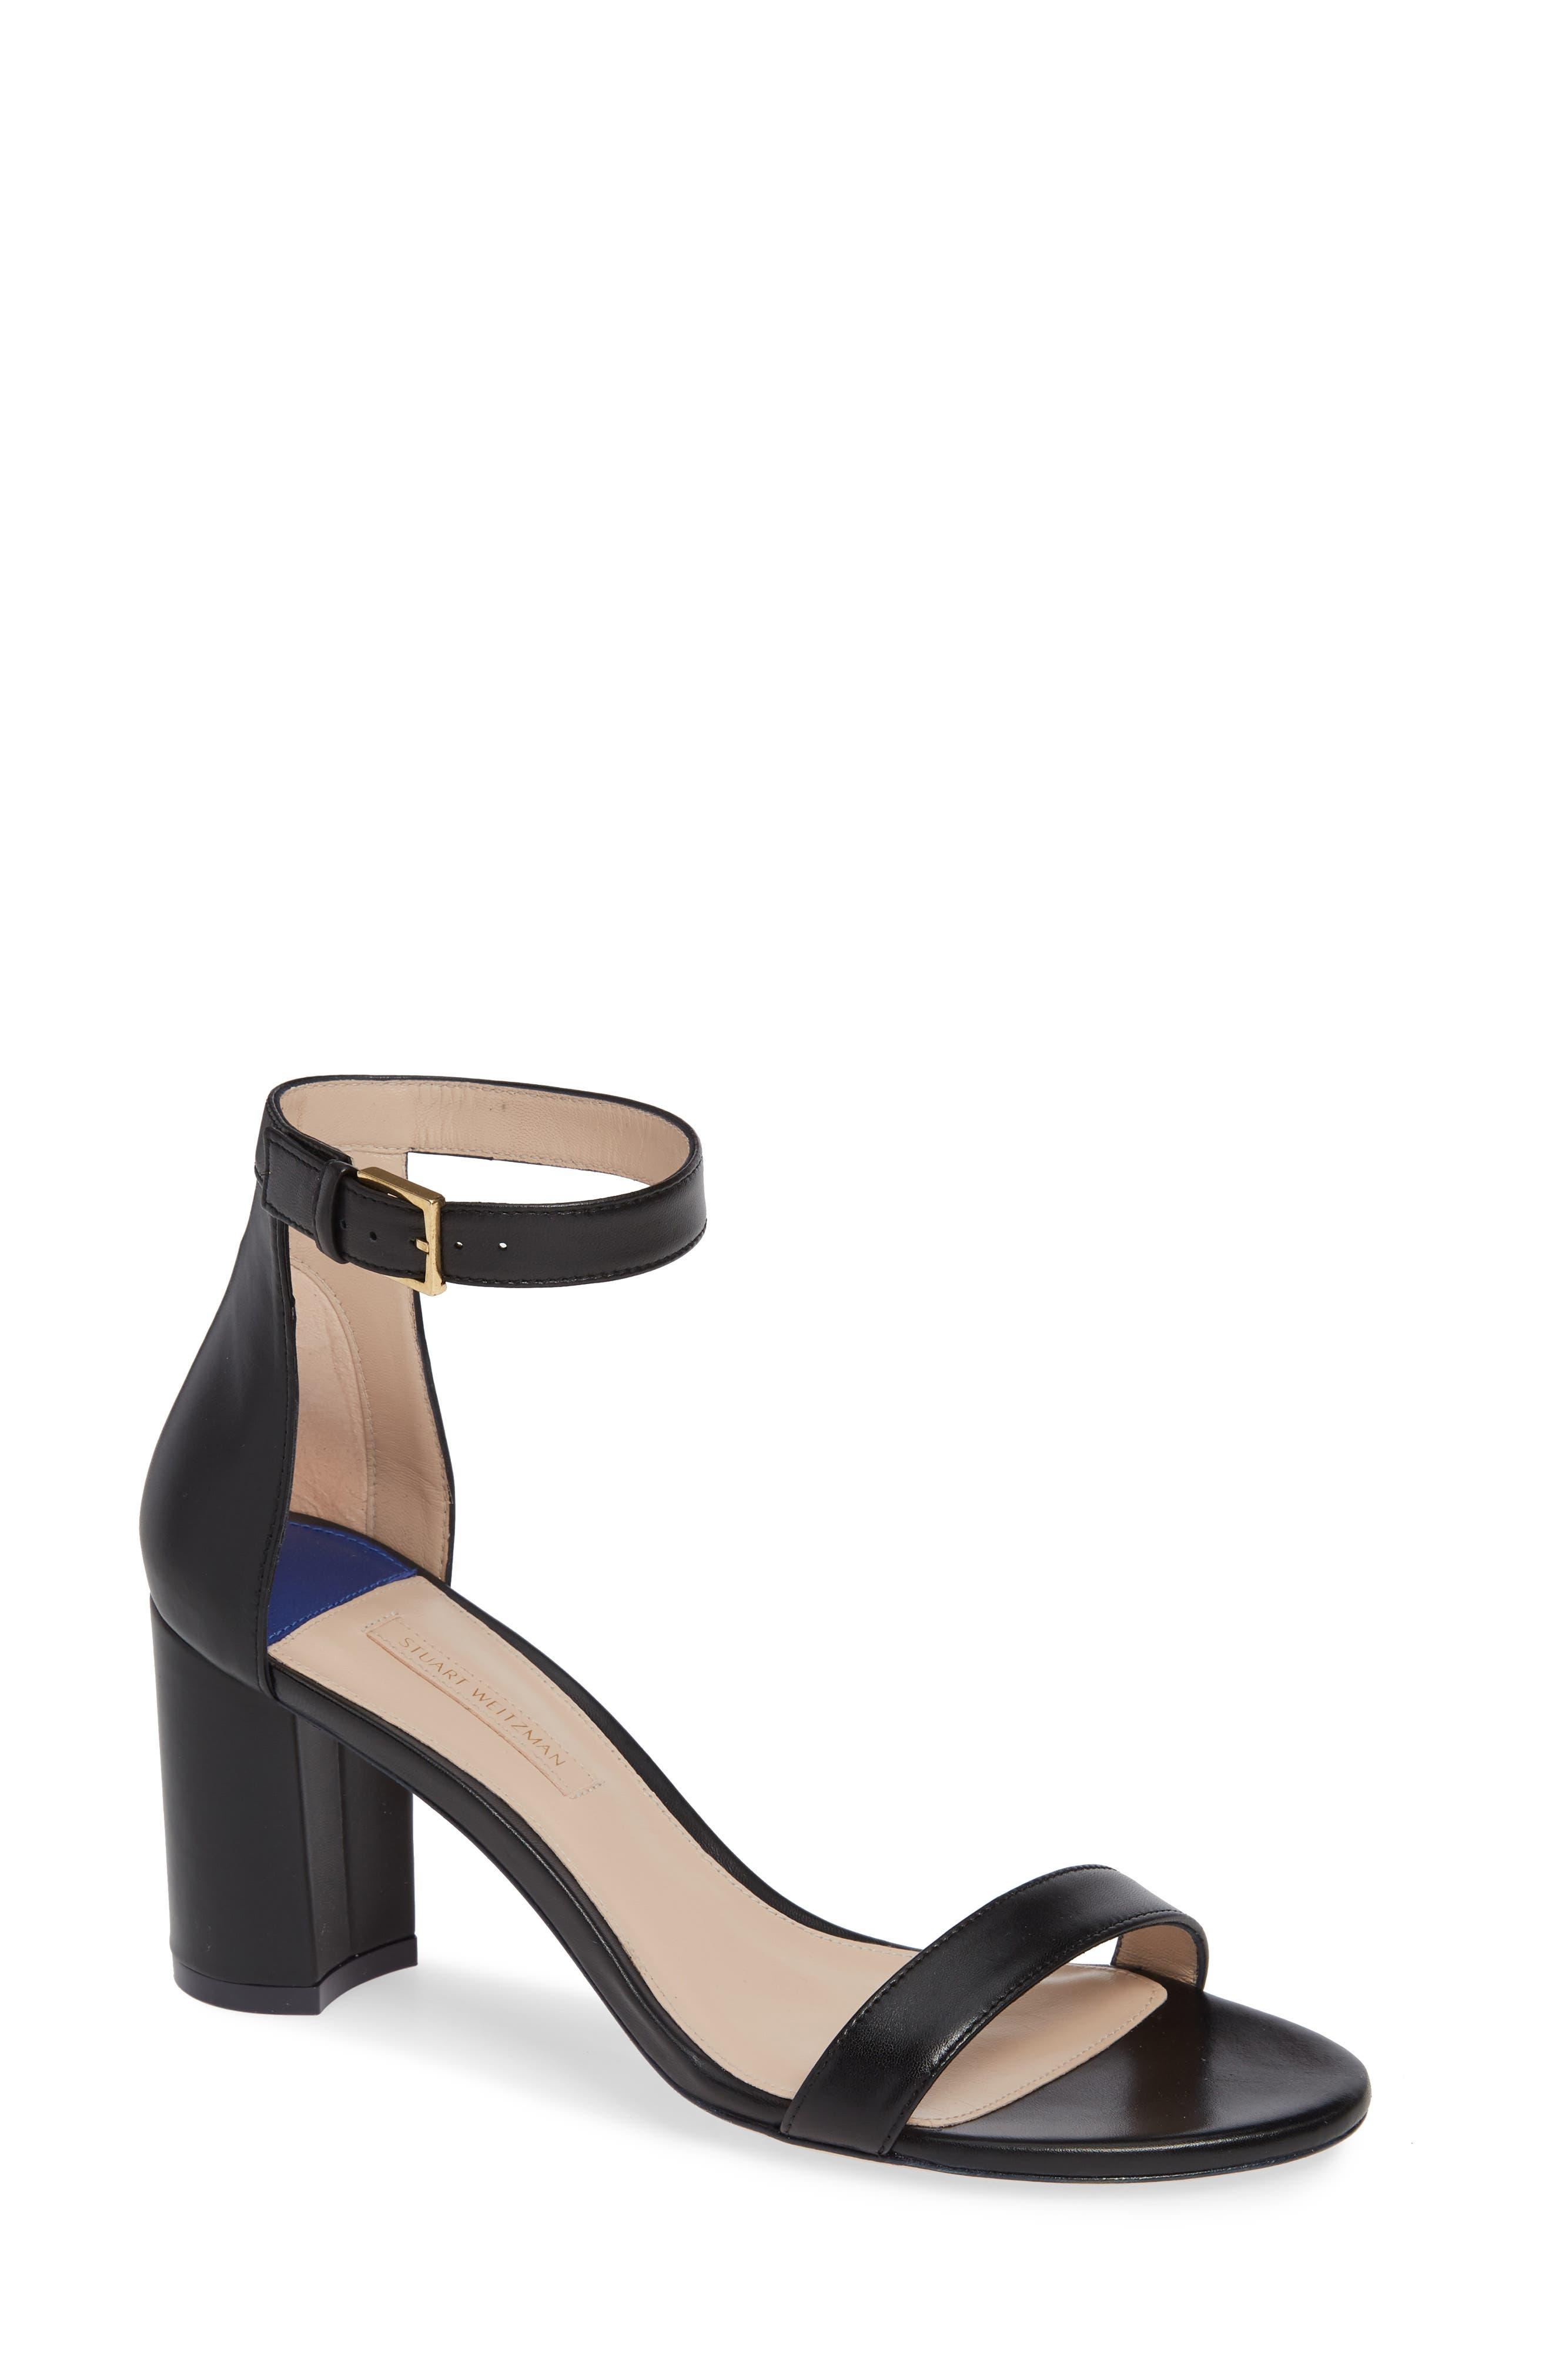 75LESSNUDIST Ankle Strap Sandal,                             Main thumbnail 1, color,                             BLACK NAPPA